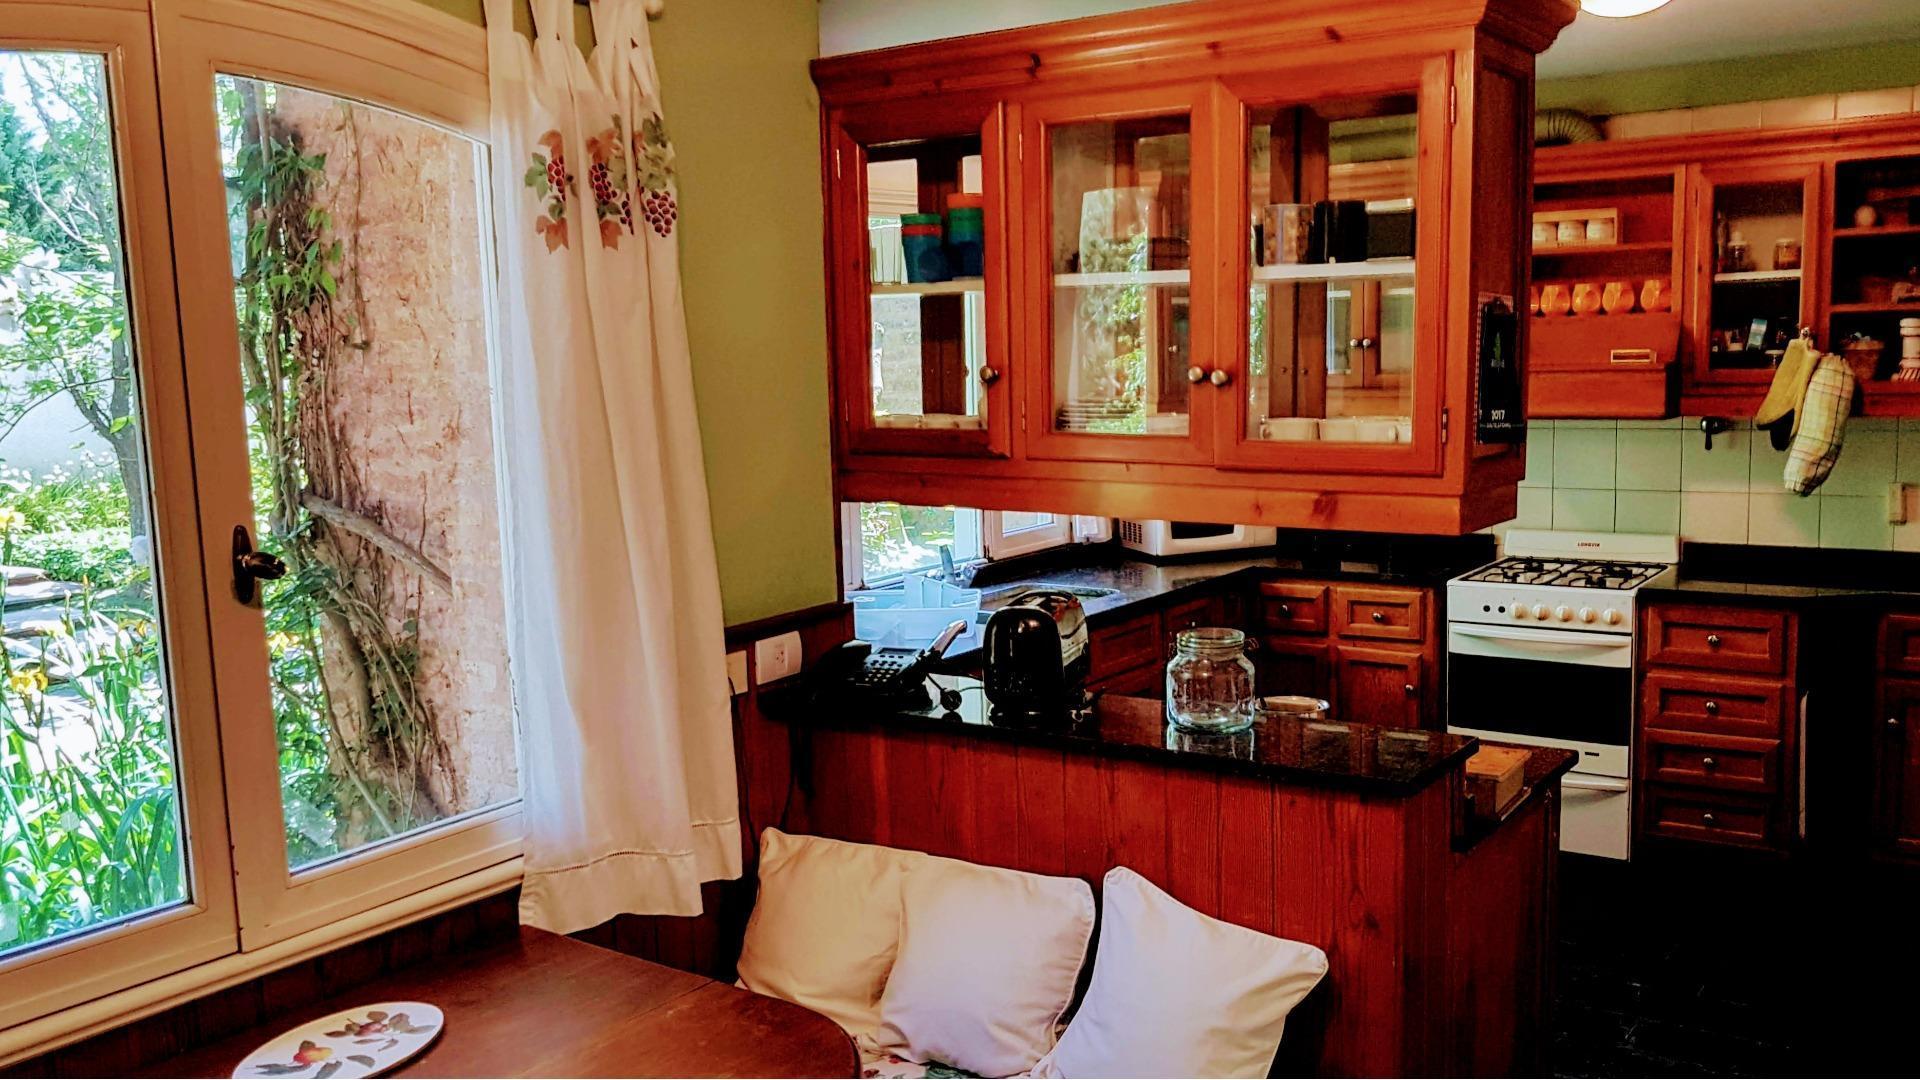 Casa en venta con pileta en barrio Martindale CC, Pilar - Foto 17